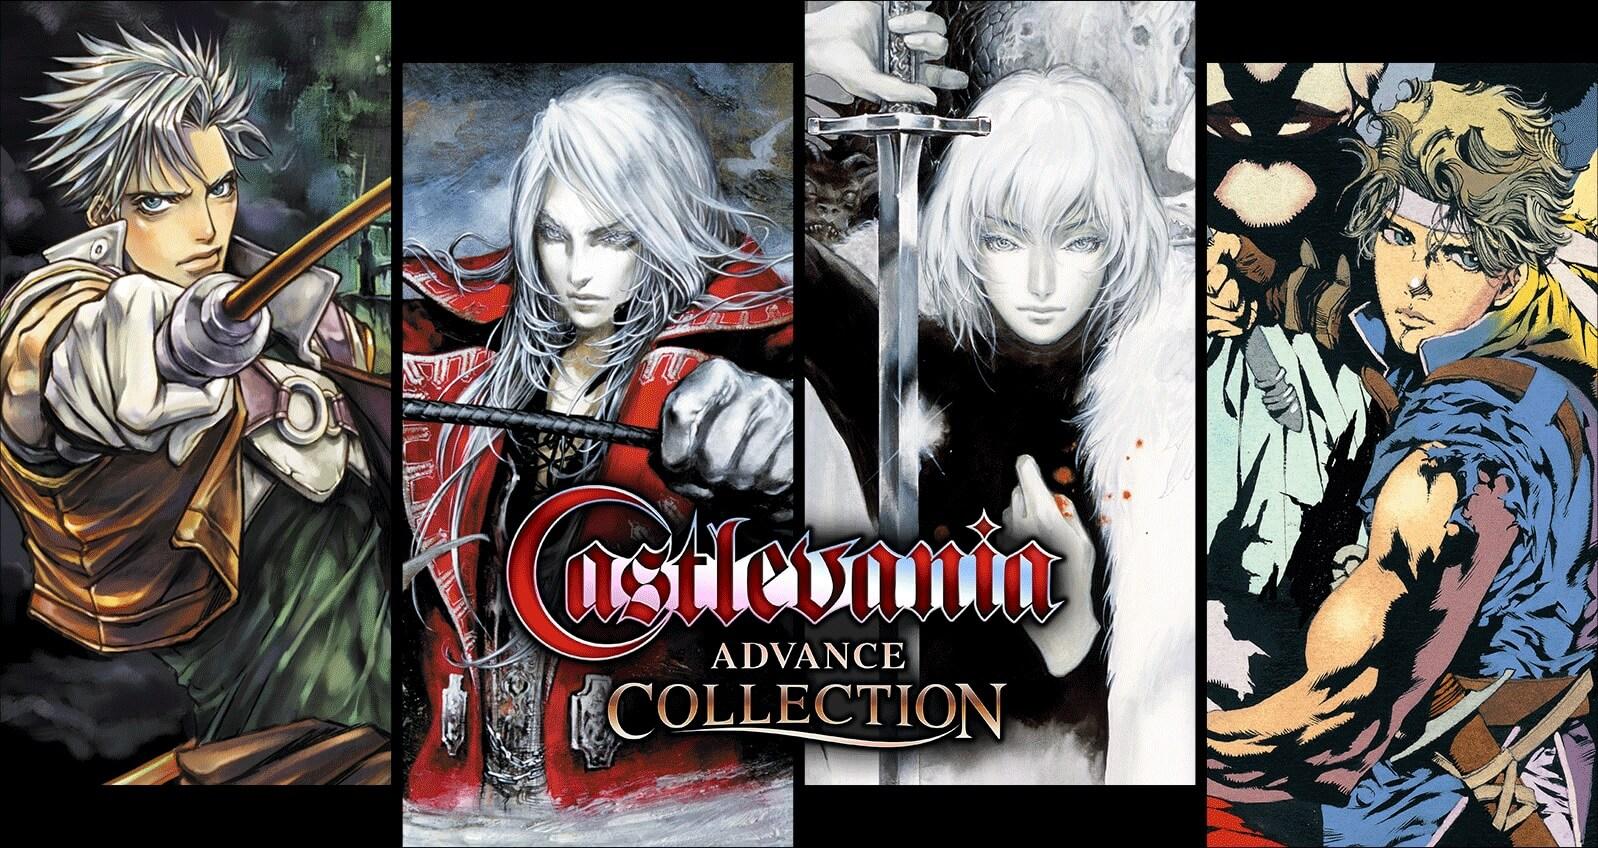 Castlevania Advance Collection ya está disponible en PS4